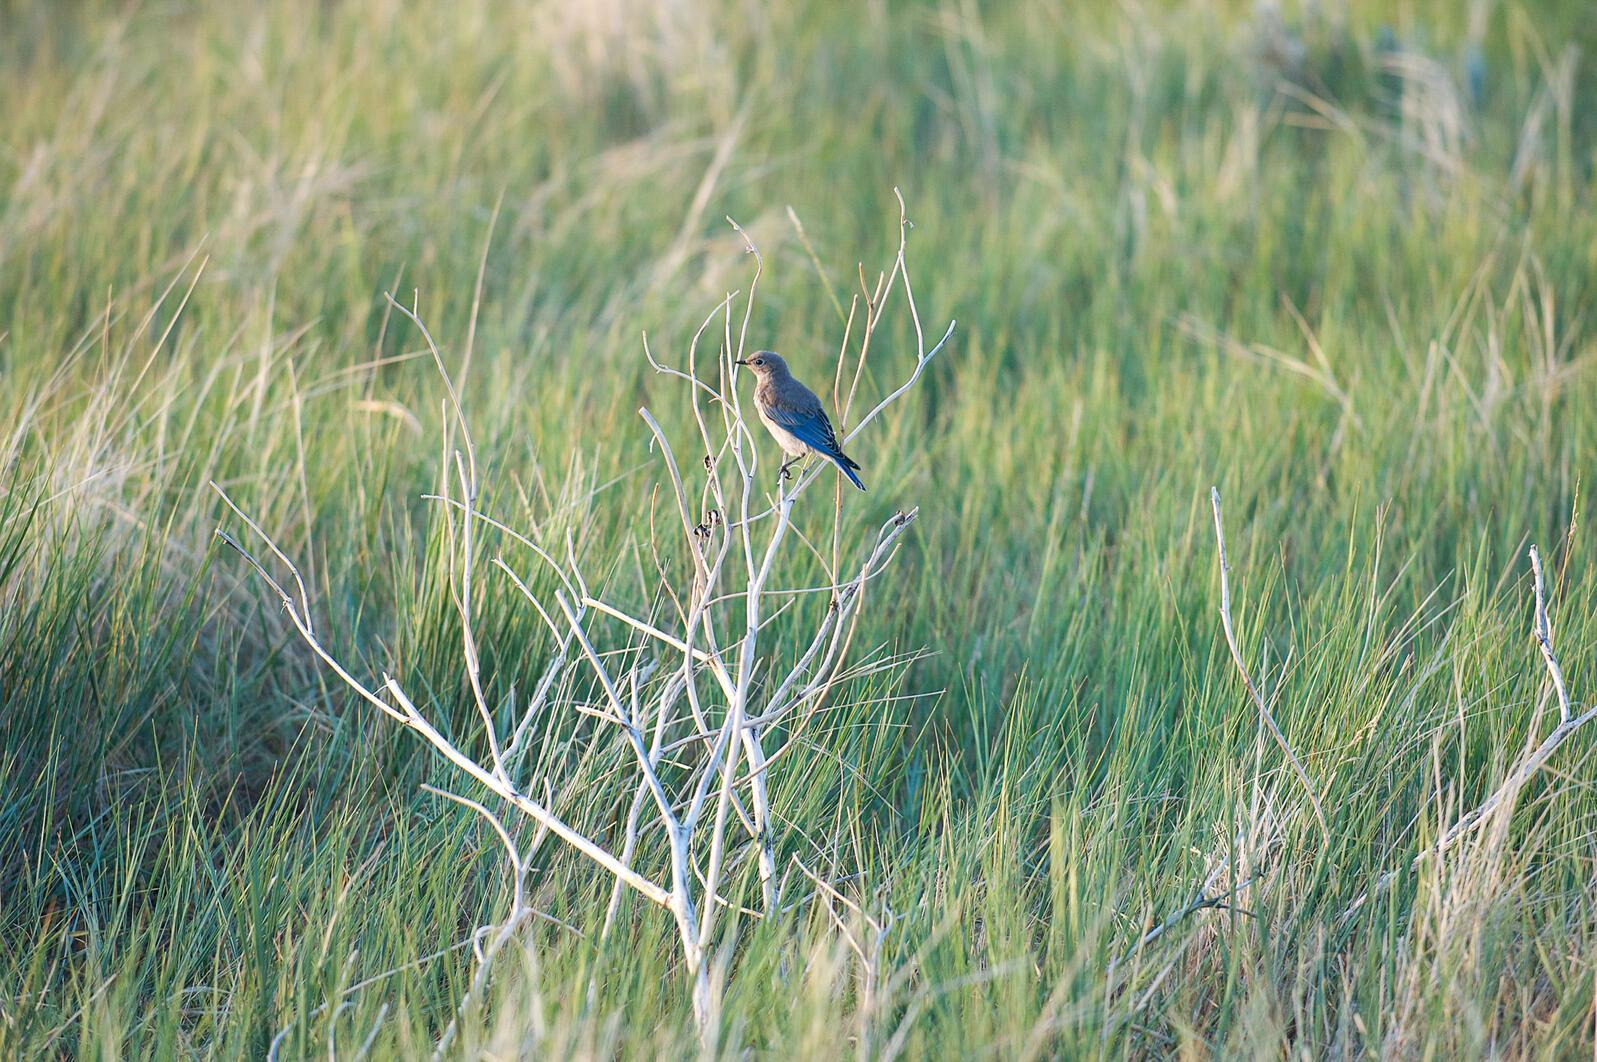 "Mountain Bluebird. <a href=""https://www.flickr.com/photos/92640669@N07/8422126978/in/photolist-mL8Q9k-dQ8EZp-dQeAXU-dQeAVQ"">bwinesett</a>/Flickr (CC BY-ND 2.0)"